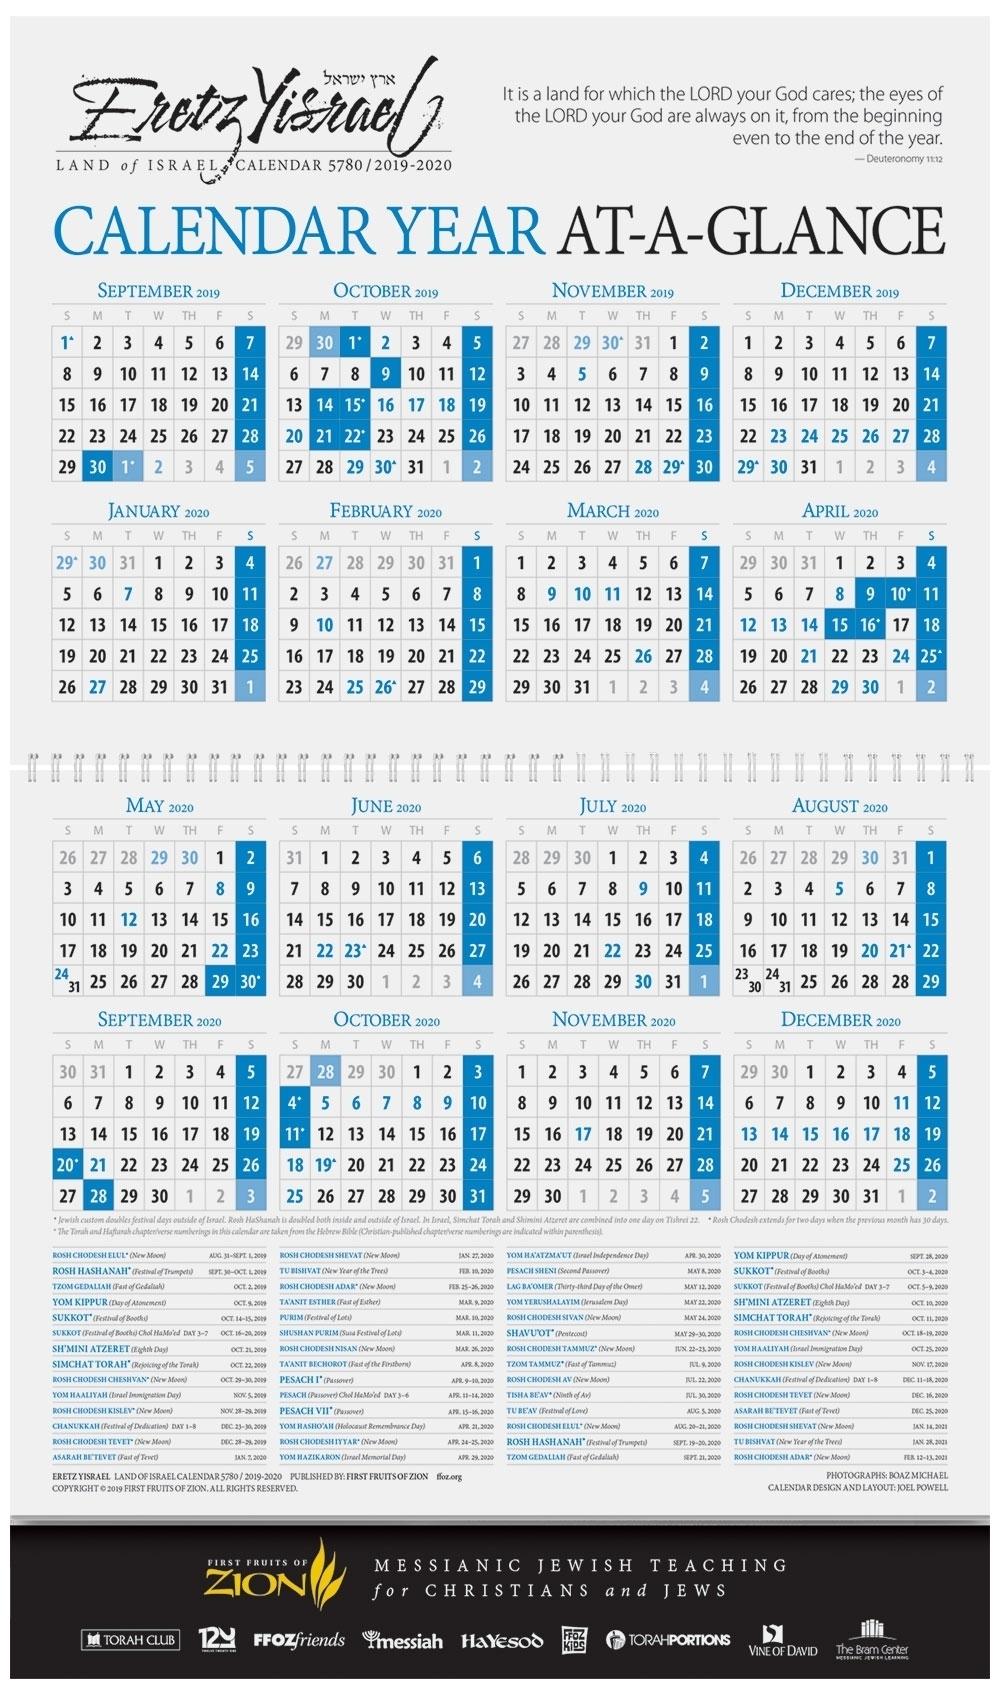 Weekly Torah Parsha Calendar For 2019/2020 - Calendar with regard to Weekly Torah Reading Portions Calendar